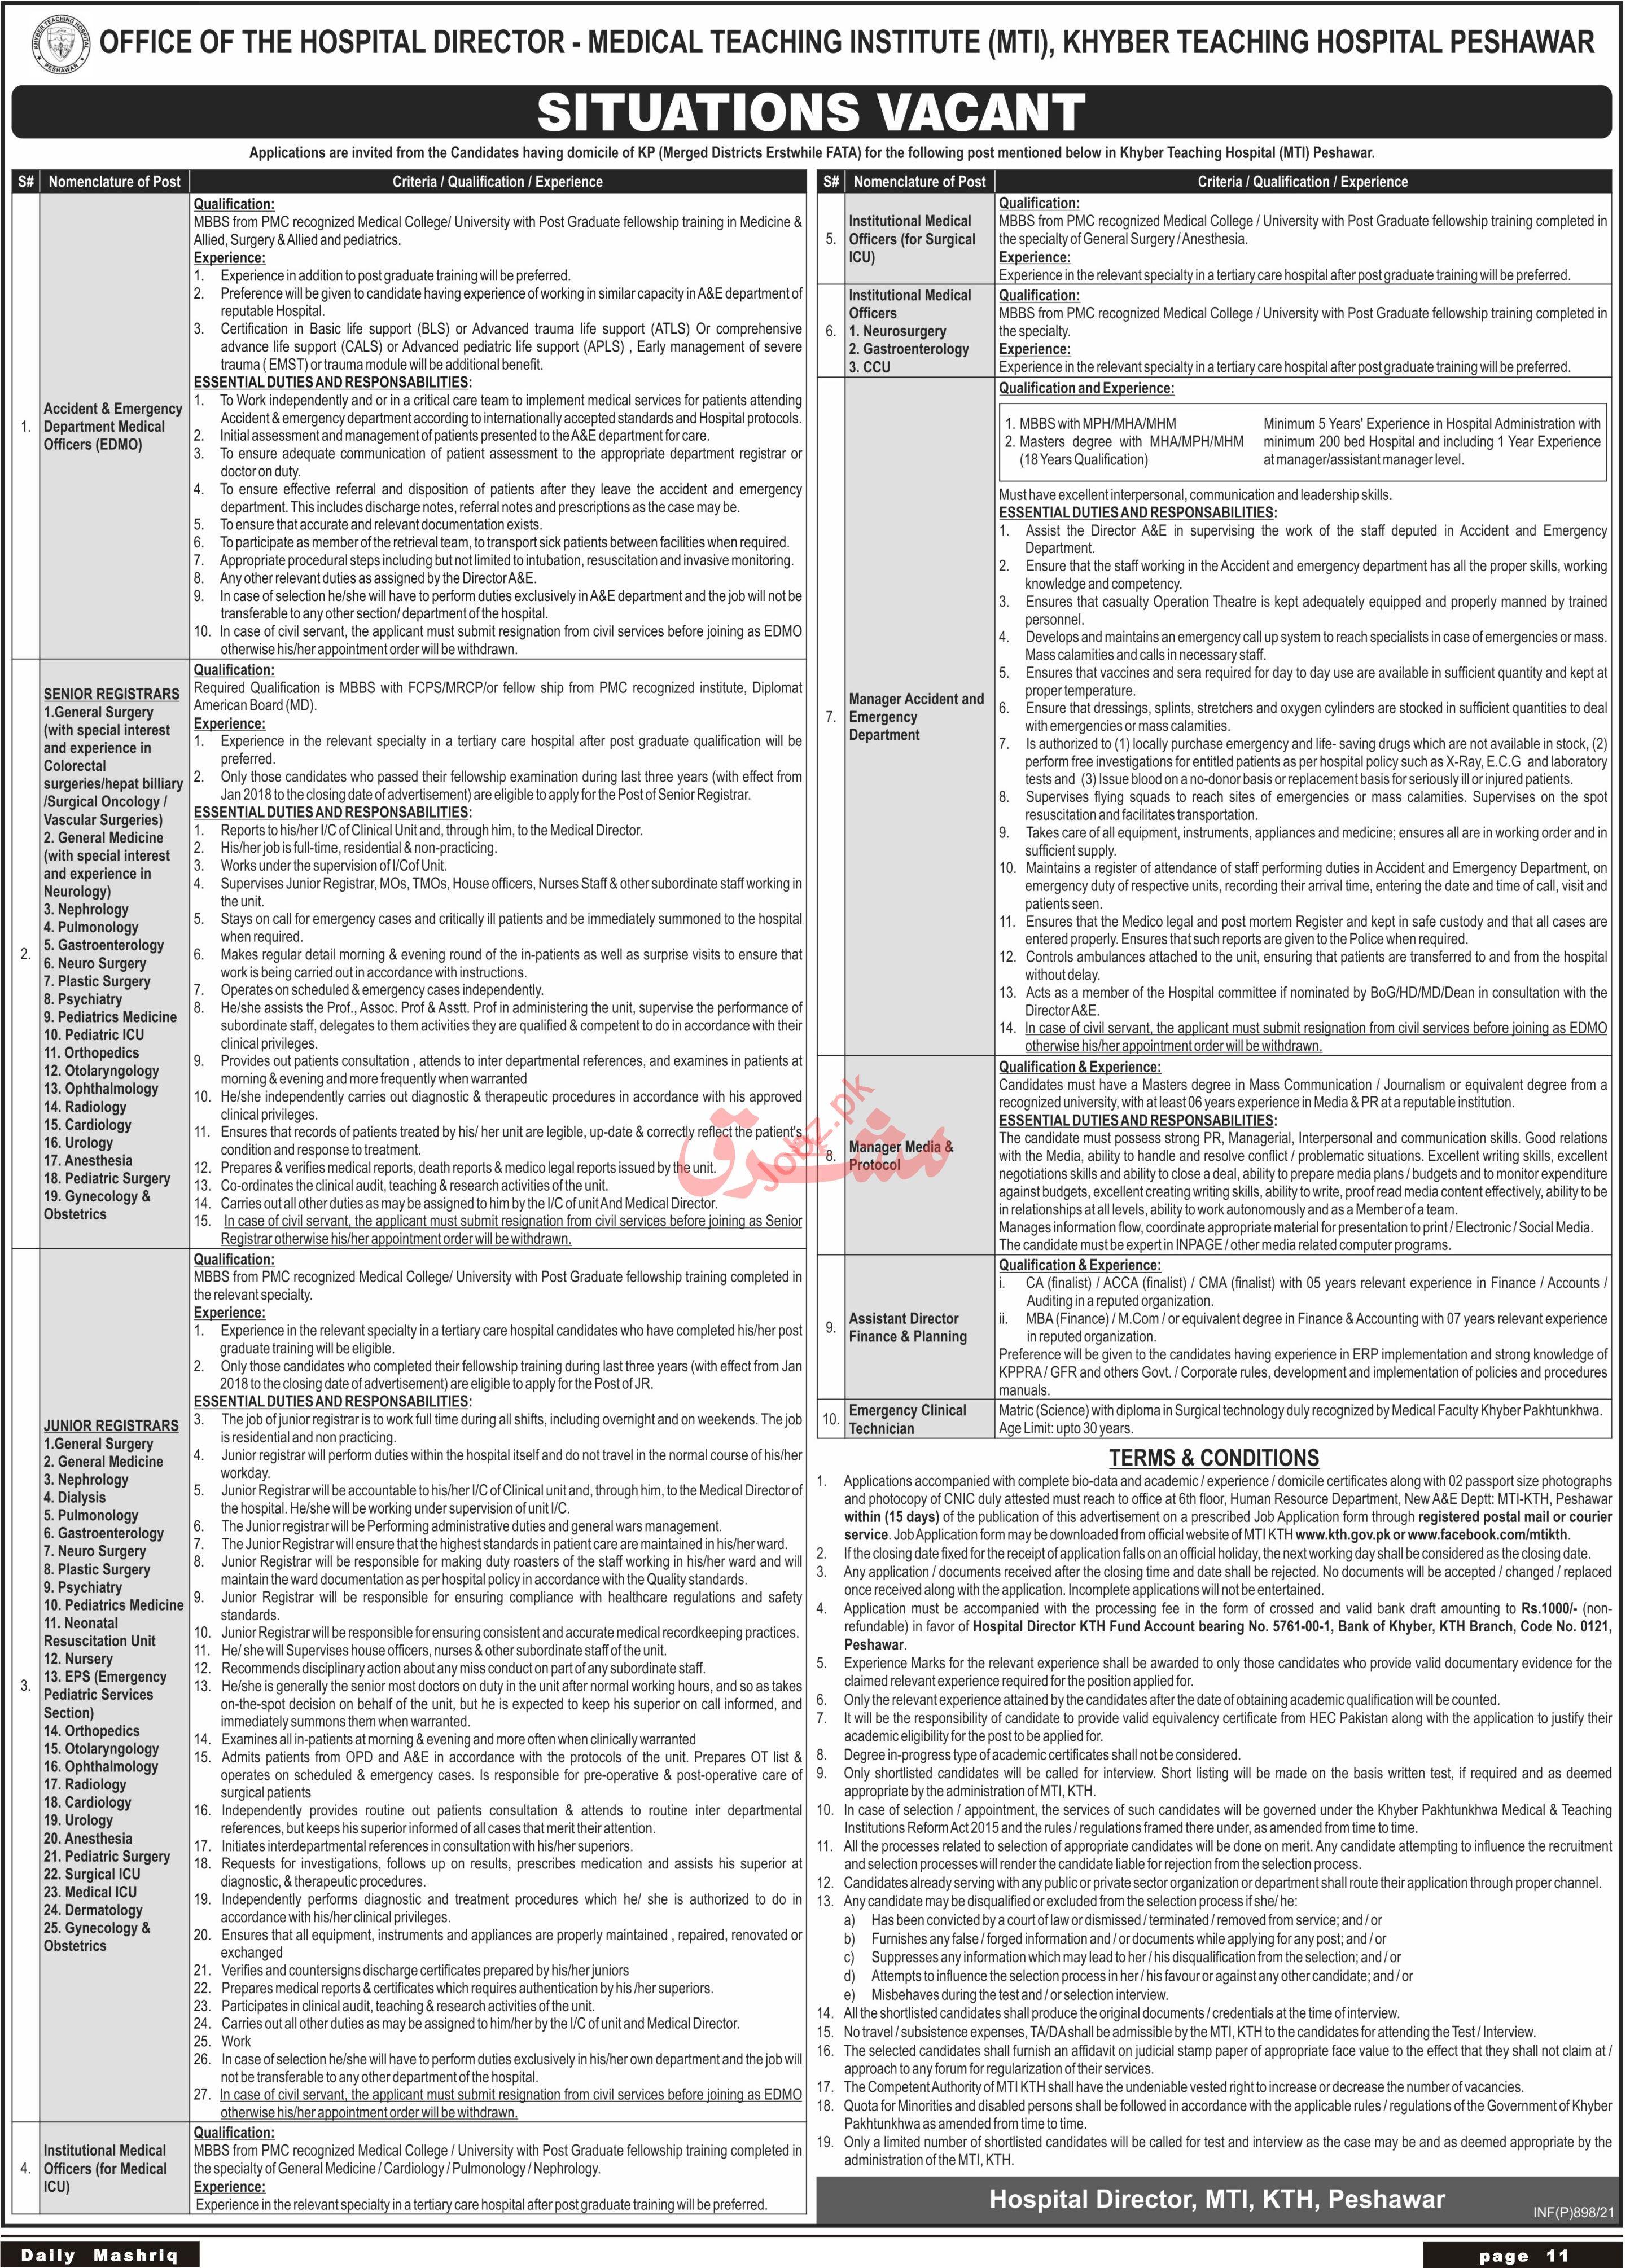 KTH MTI Khyber Teaching Hospital Peshawar Jobs 2021